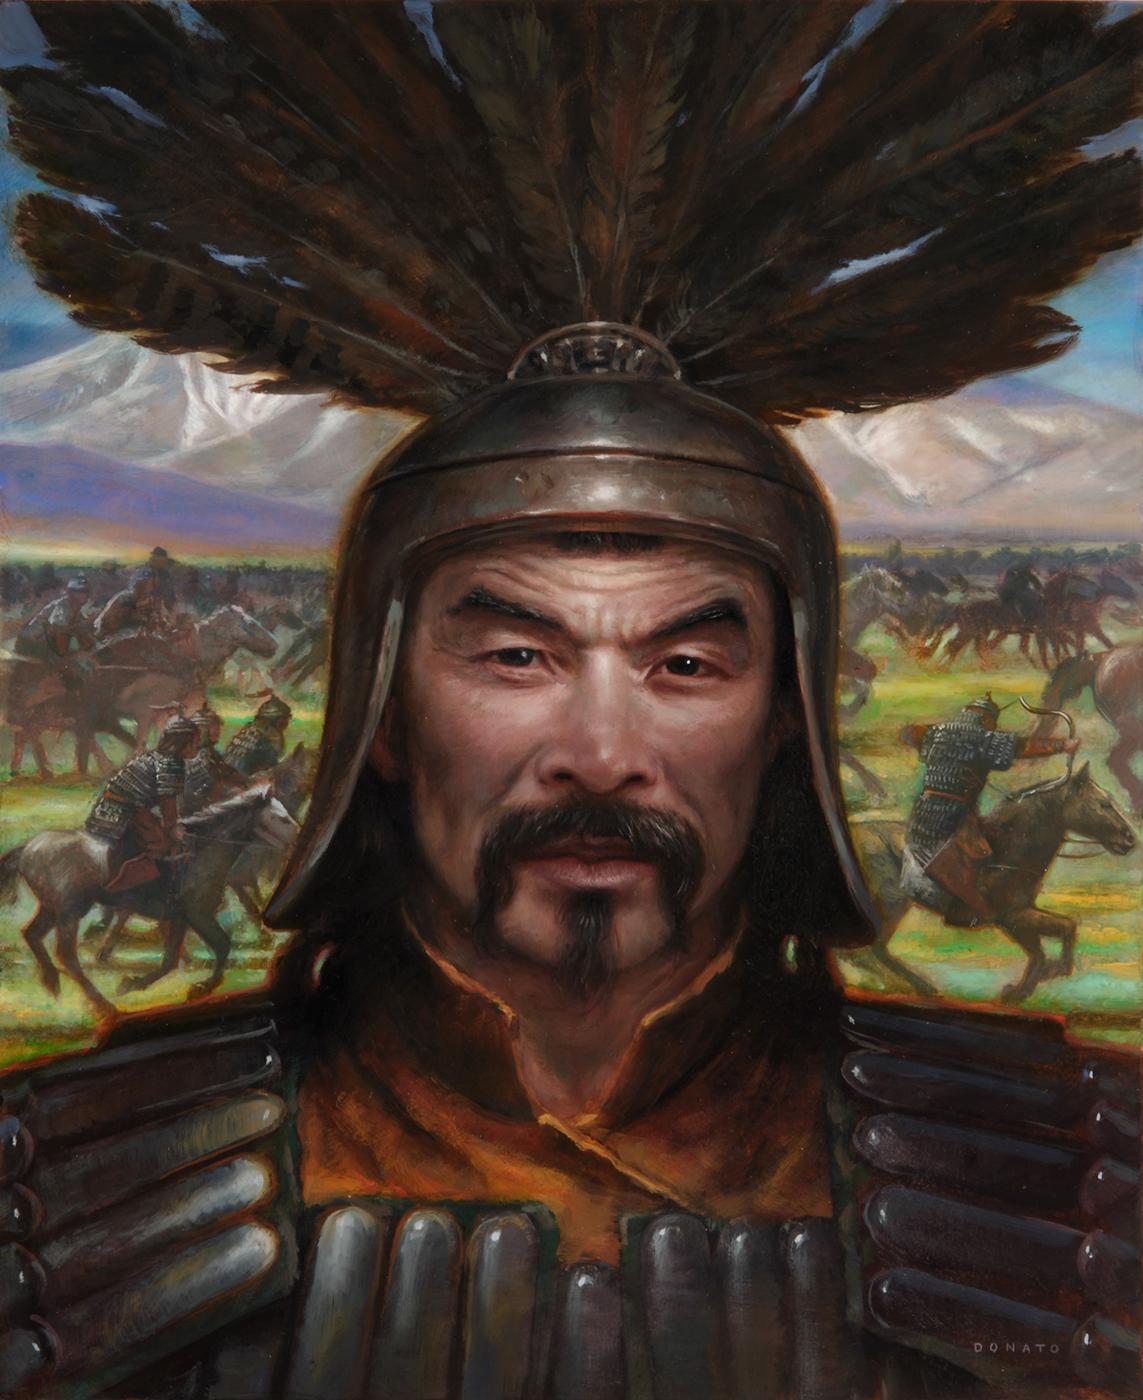 https://0201.nccdn.net/4_2/000/000/07e/96f/GenghisKhan-donato.jpg